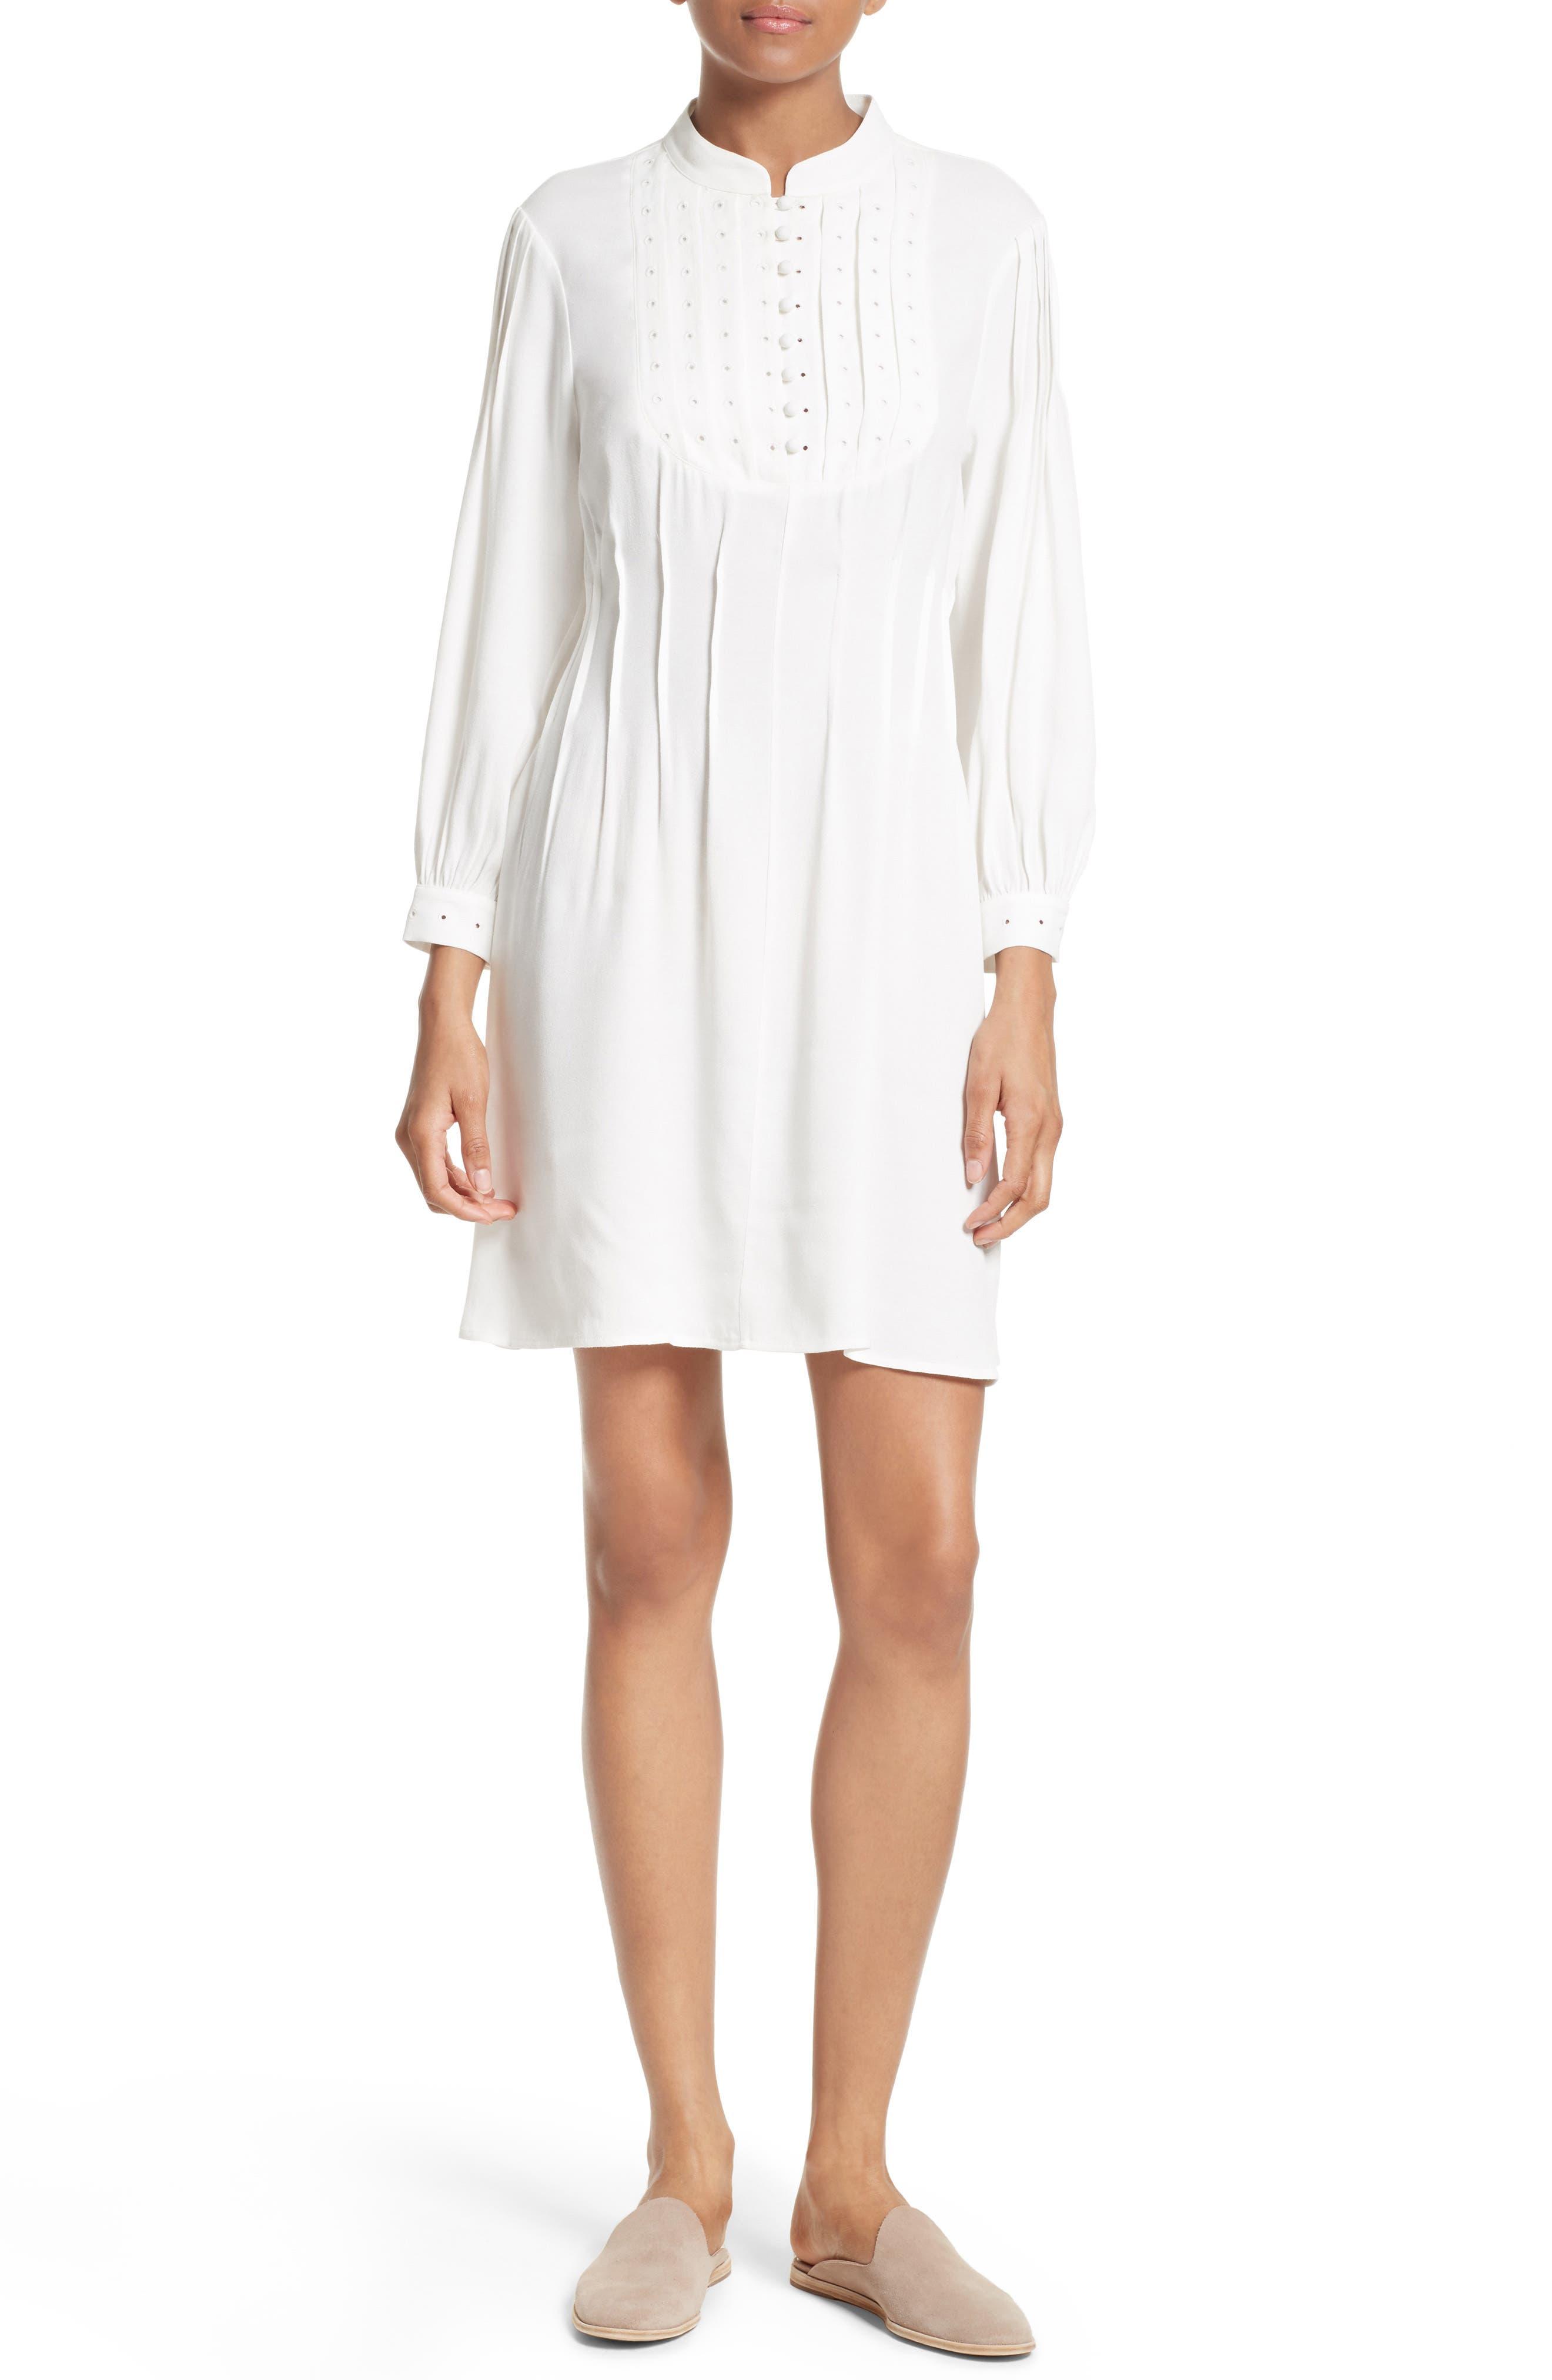 Alternate Image 1 Selected - FRAME Pleated Eyelet Dress